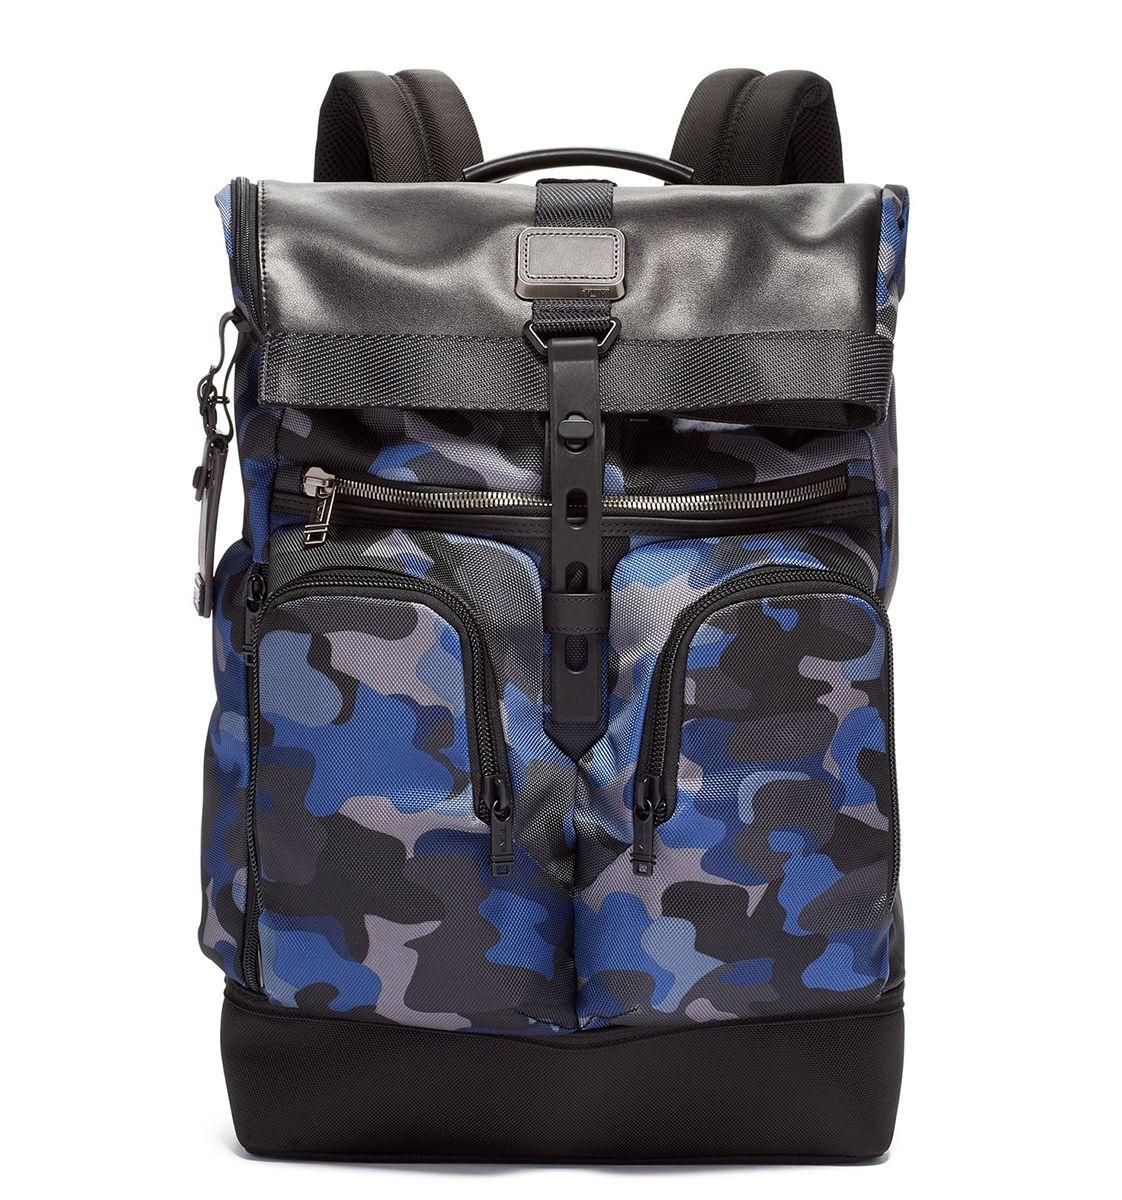 0e96b21c9 Tumi Alpha Bravo Camo London Roll Top Backpack - 1037058138